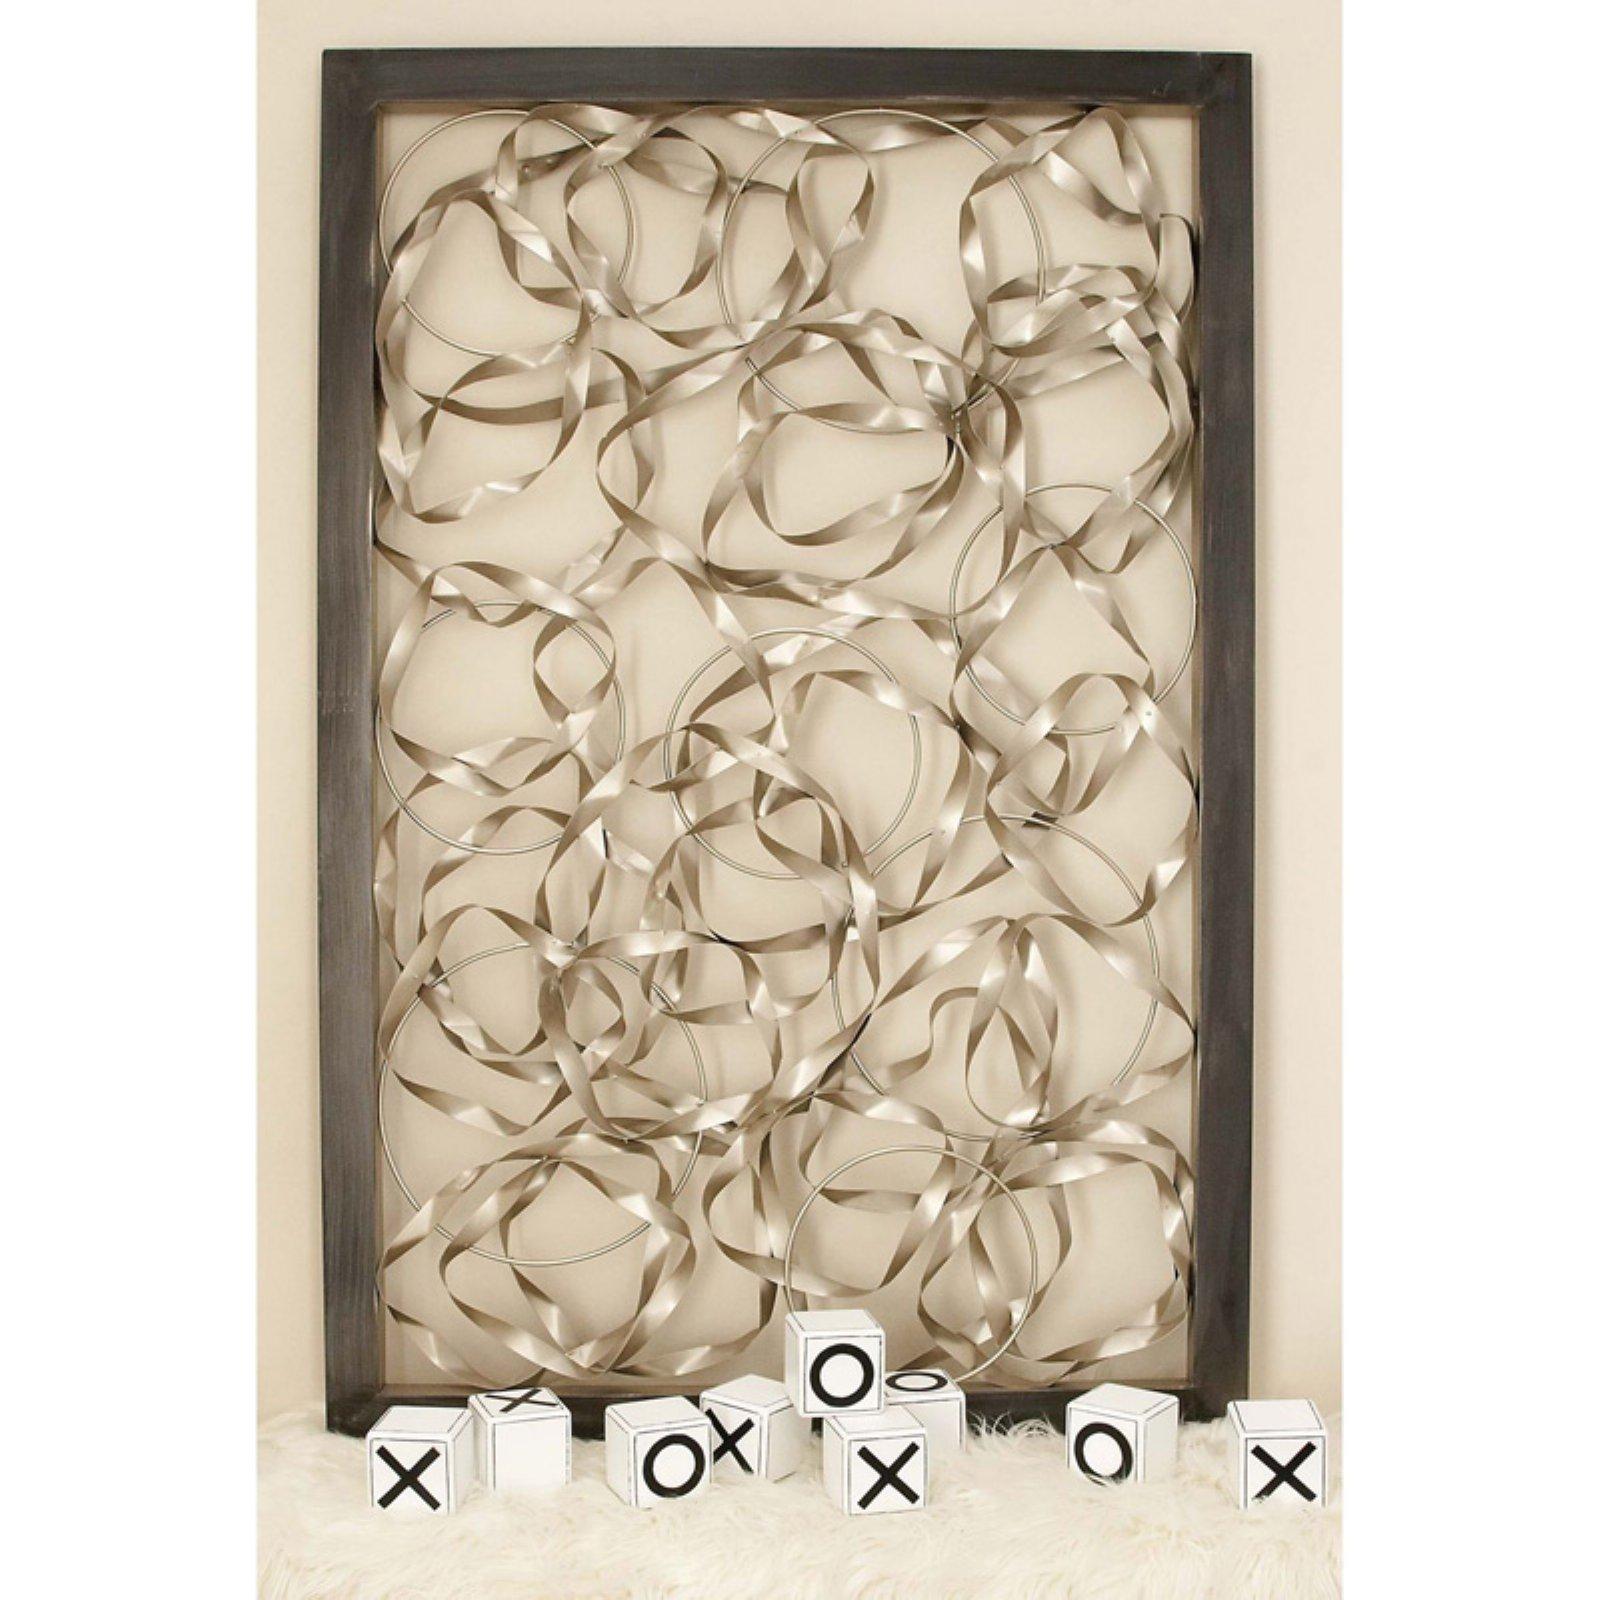 Decmode Wood Framed Silver Metal Ribbon Wall Art 60w X 40h